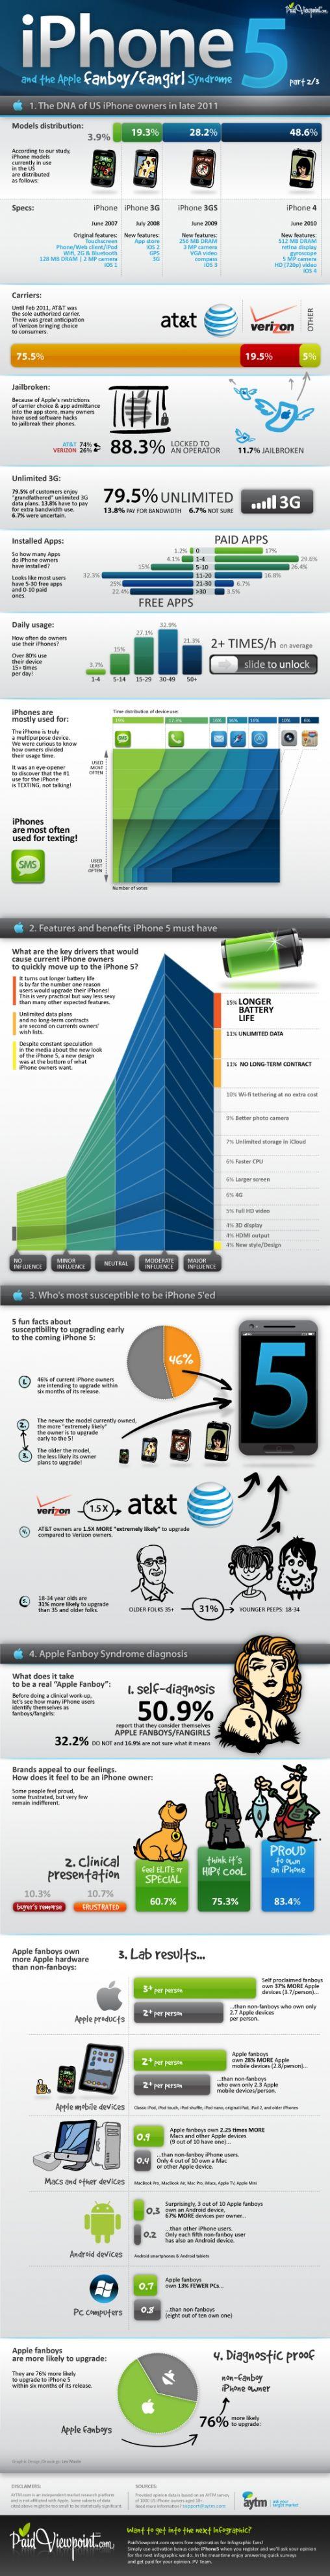 Infographic_3_parts-02_550